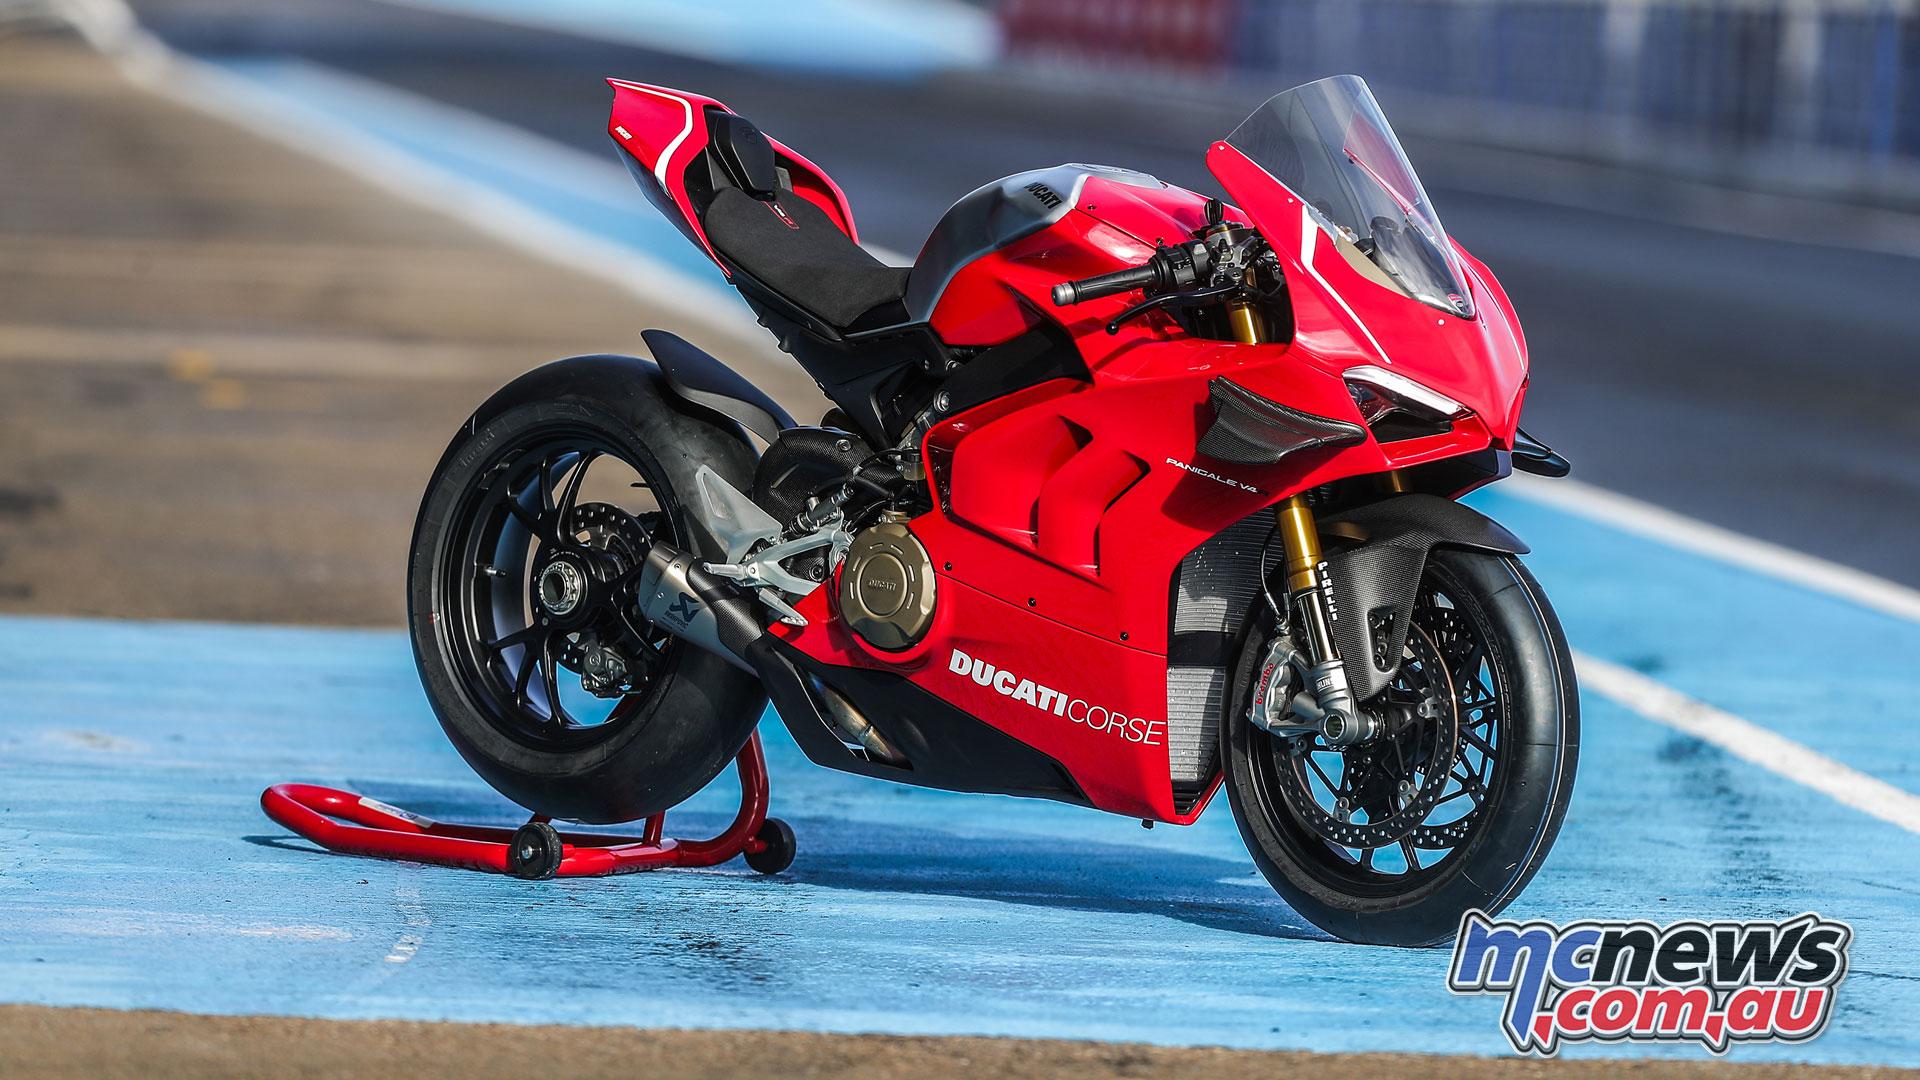 2019 Ducati Panigale V4 R | 998cc racer | More tech details! | MCNews.com.au